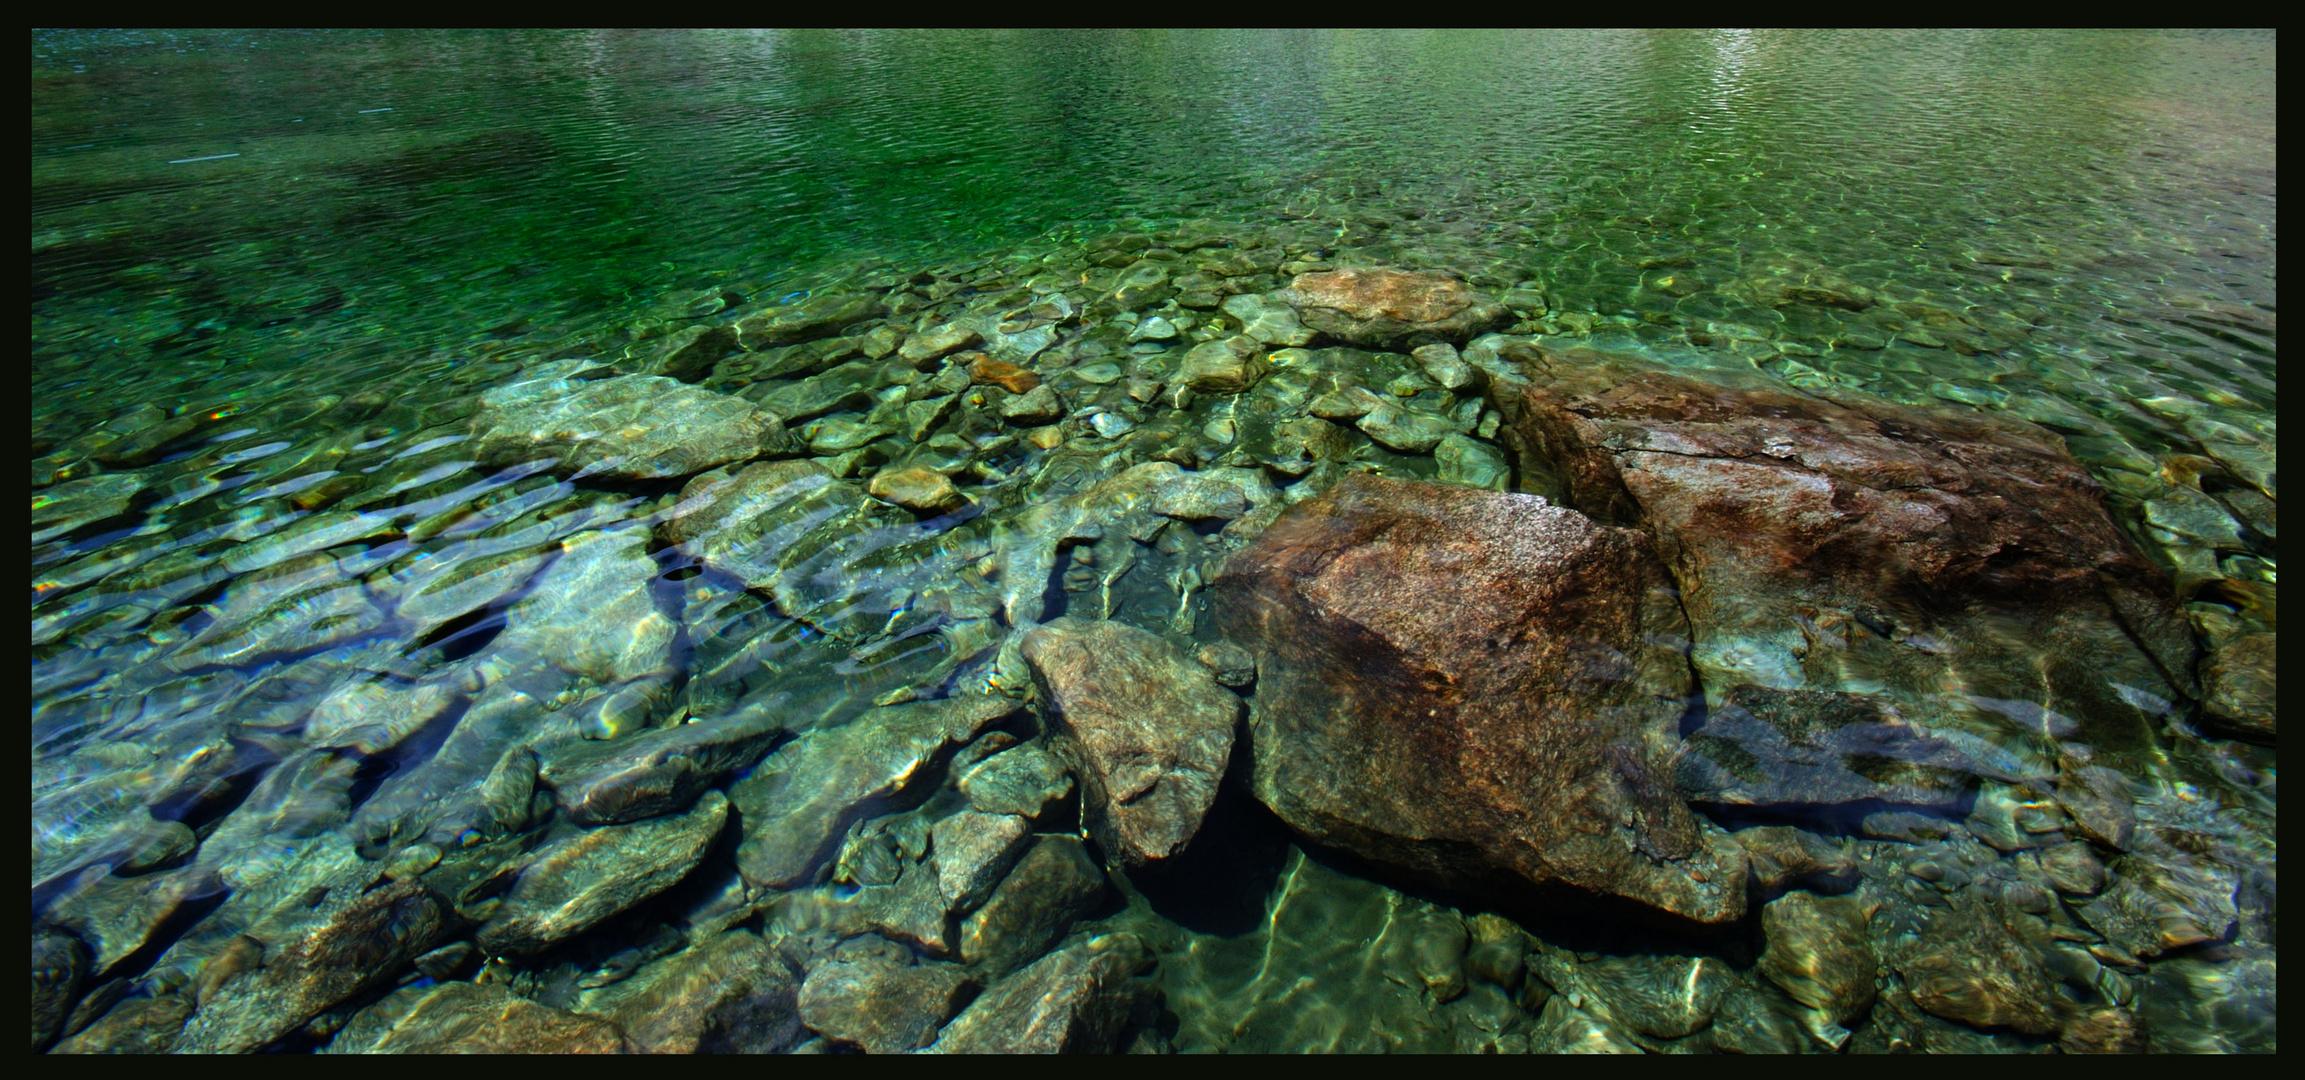 greenblue Stoneoasis